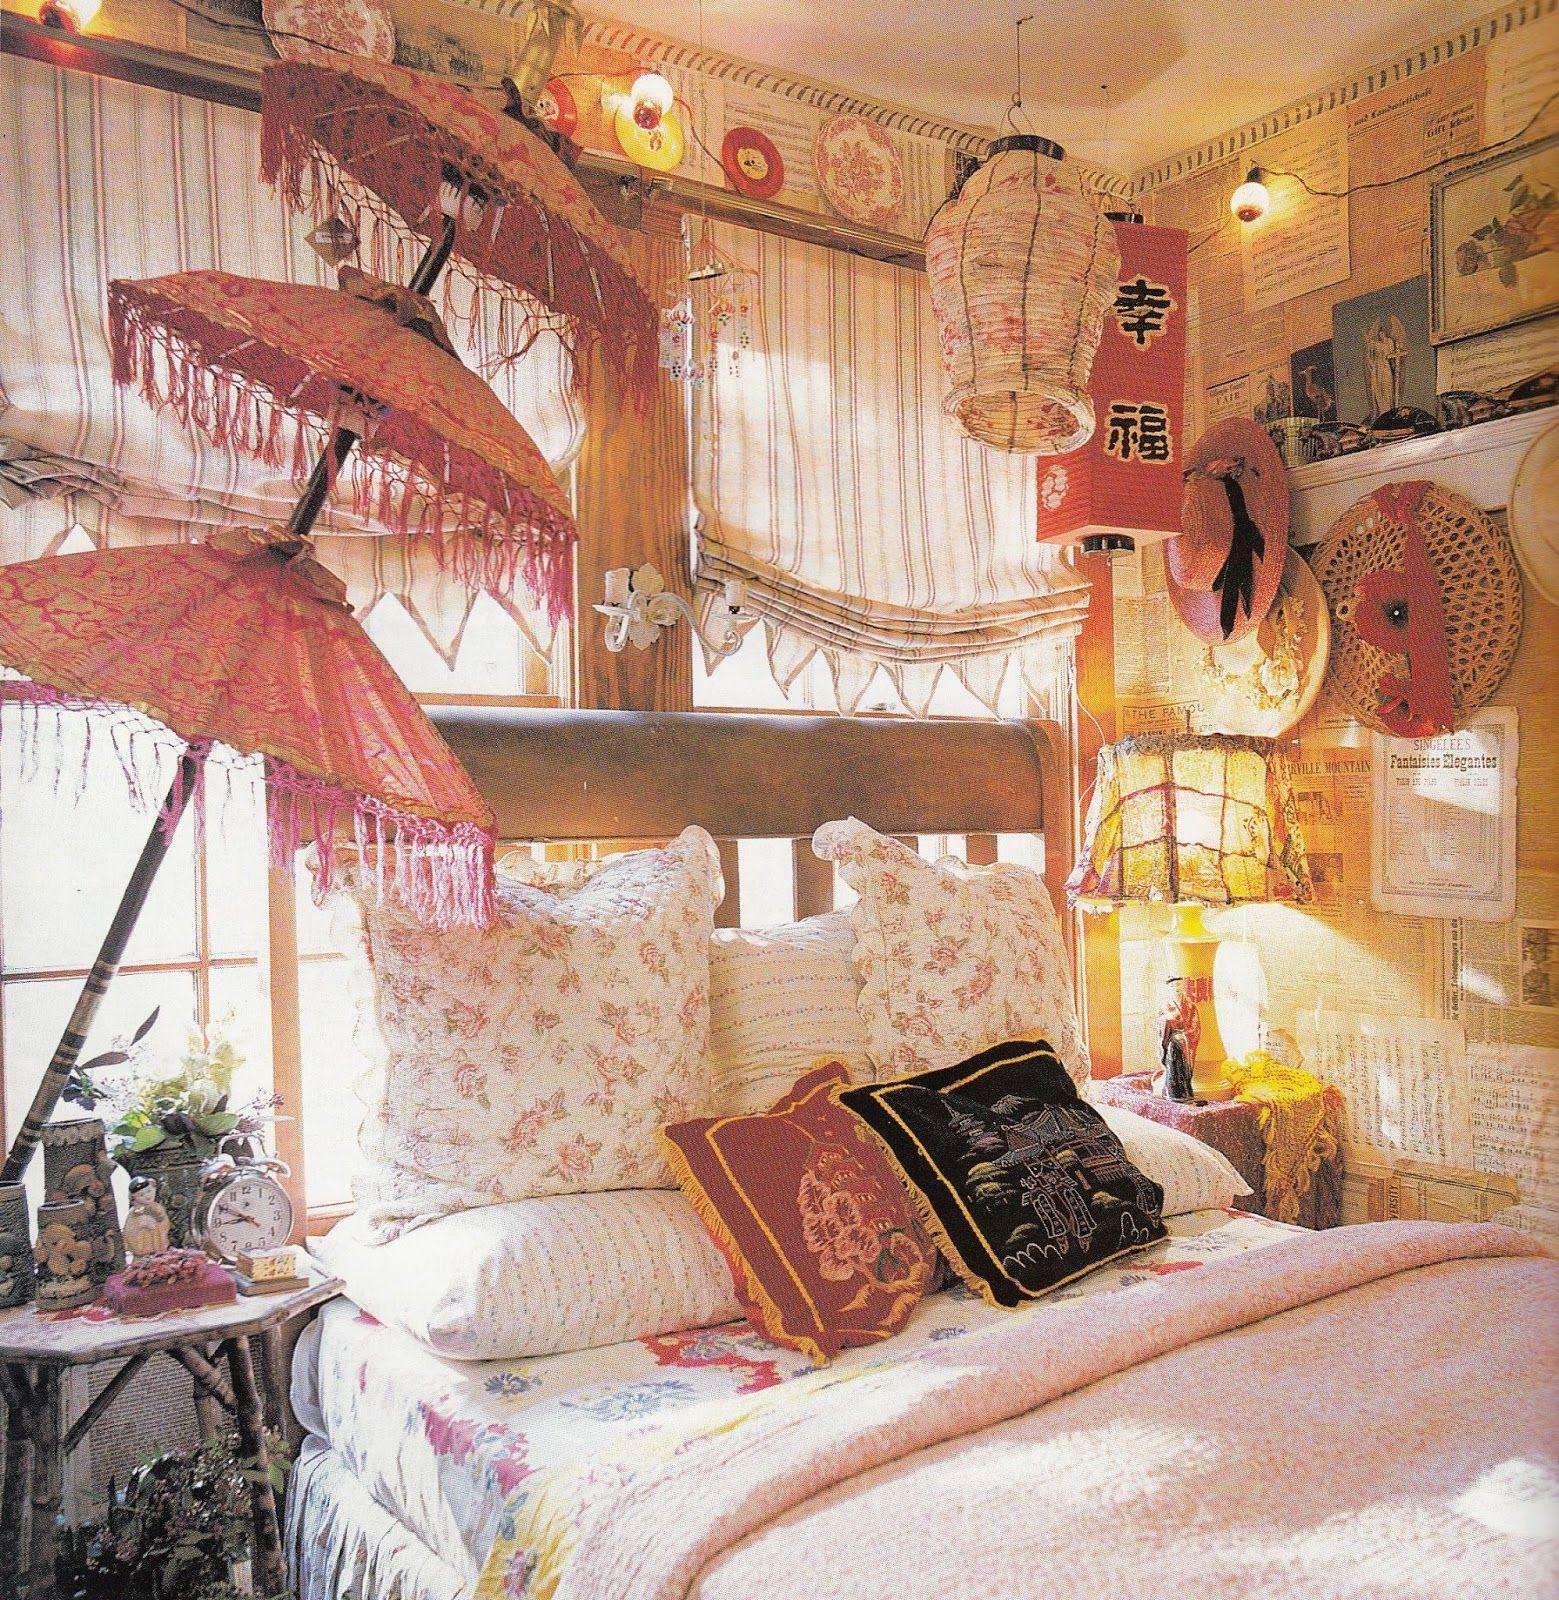 terrific bohemian bedroom inspiration | Babylon Sisters: Bedroom Inspiration | boho, gypsy, hippie ...